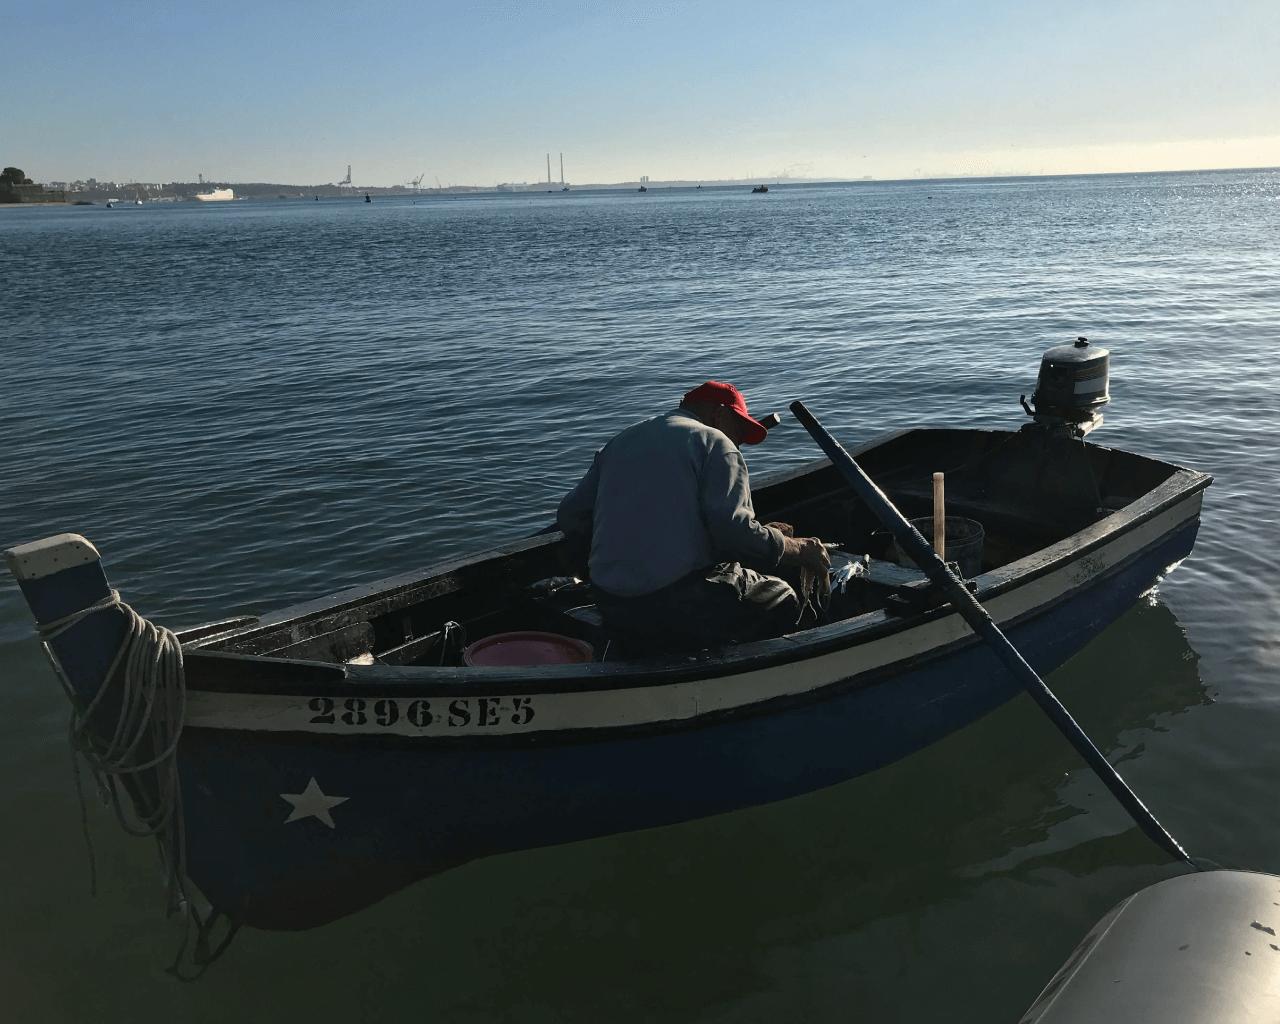 Art de pêche traditionnels